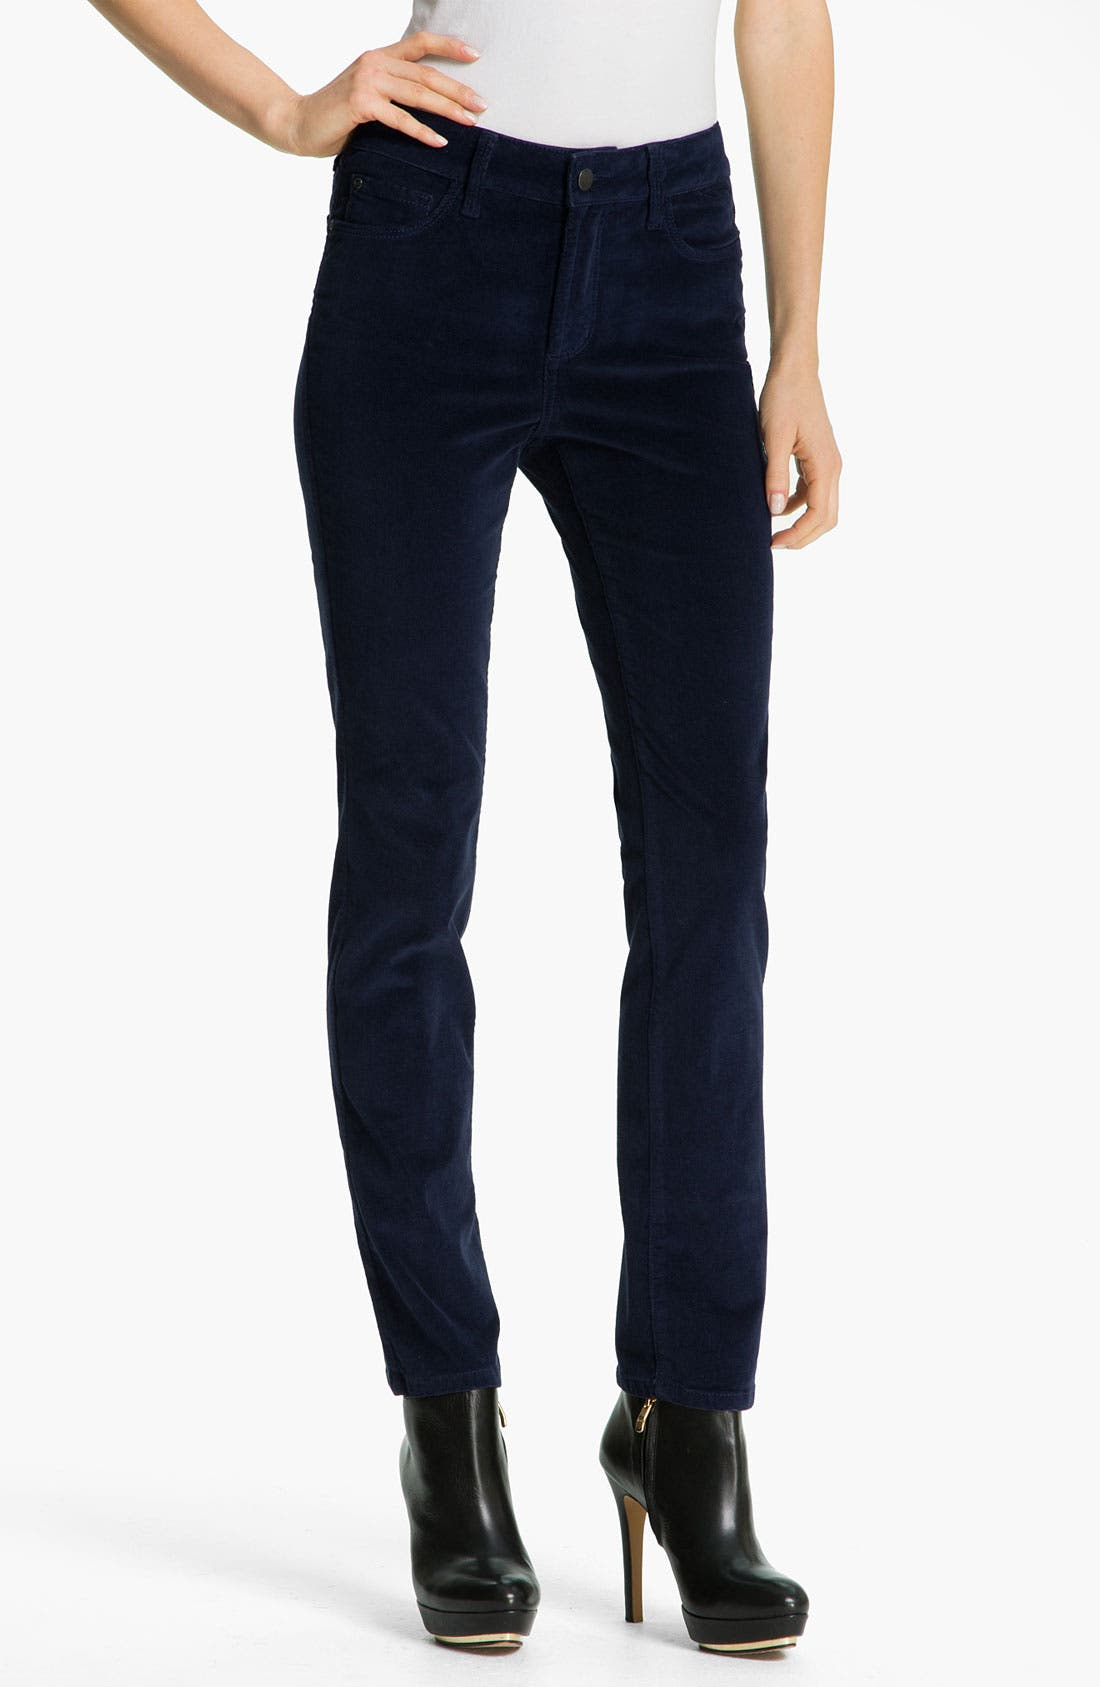 Alternate Image 1 Selected - NYDJ Skinny Corduroy Jeans (Petite)